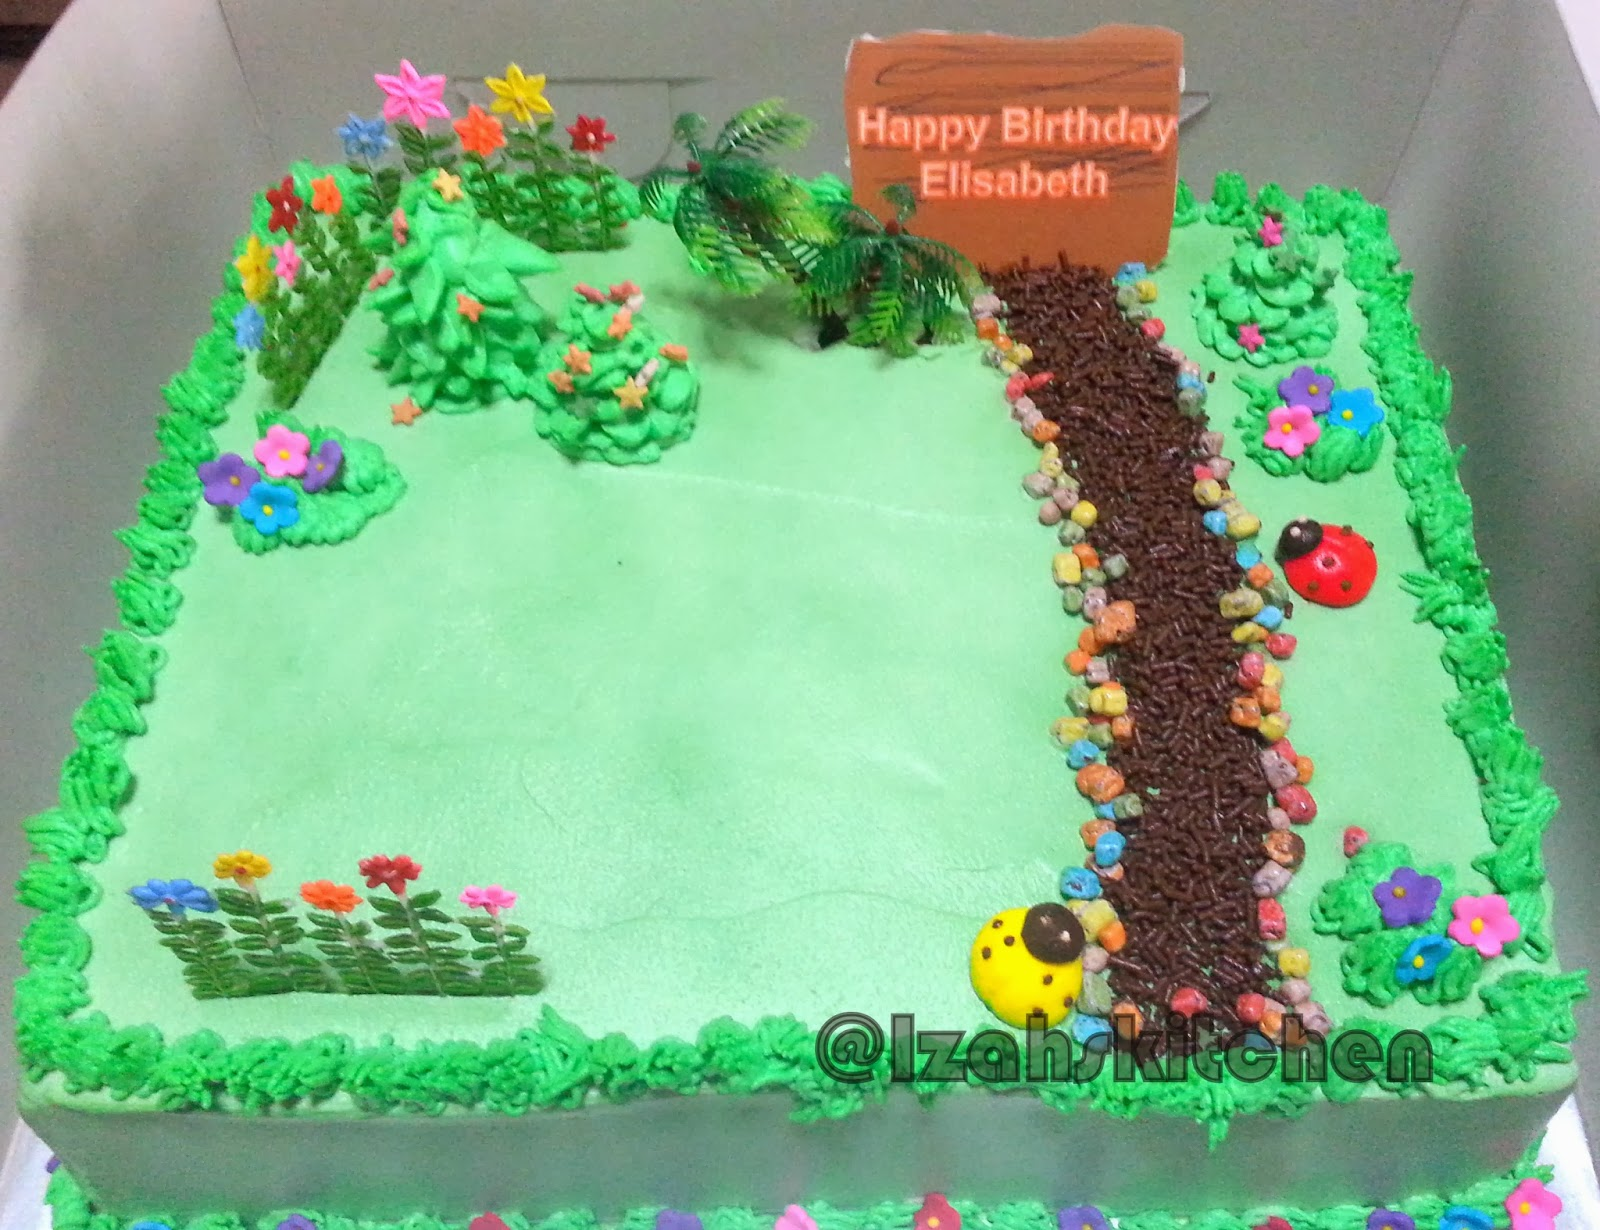 Izah\'s Kitchen: Garden Themed cake